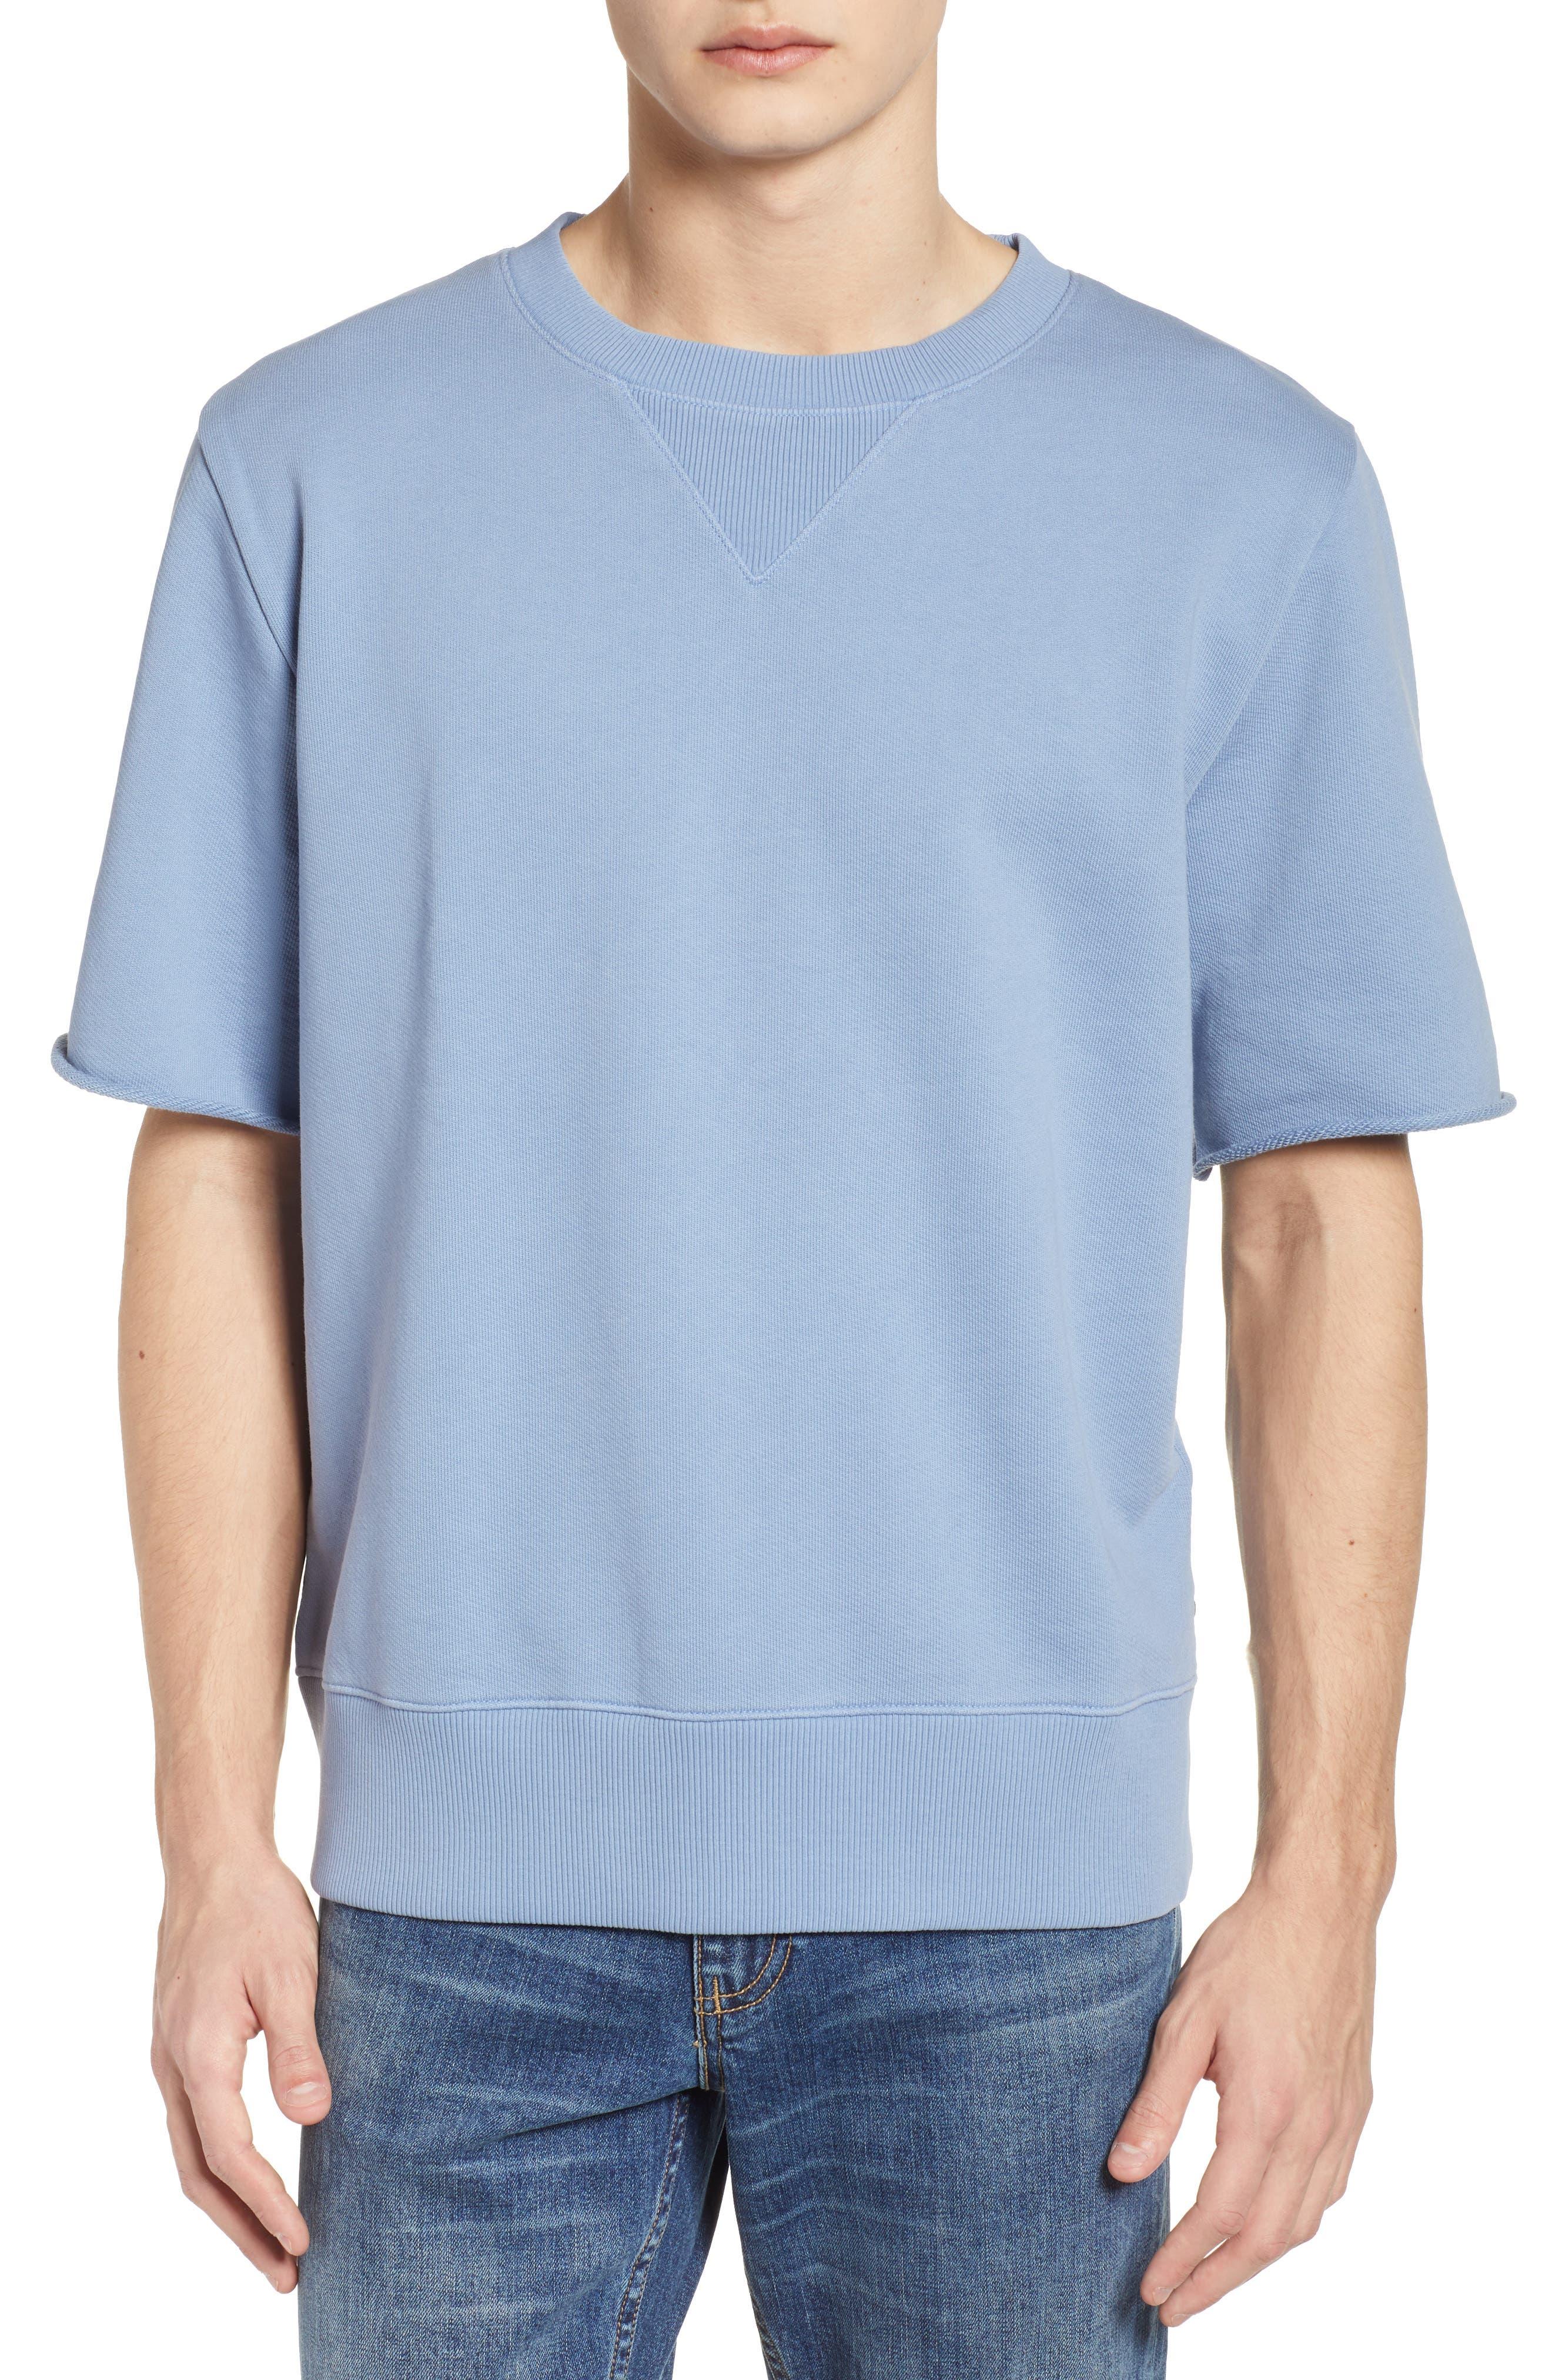 Cotton Terry Sweatshirt,                             Main thumbnail 1, color,